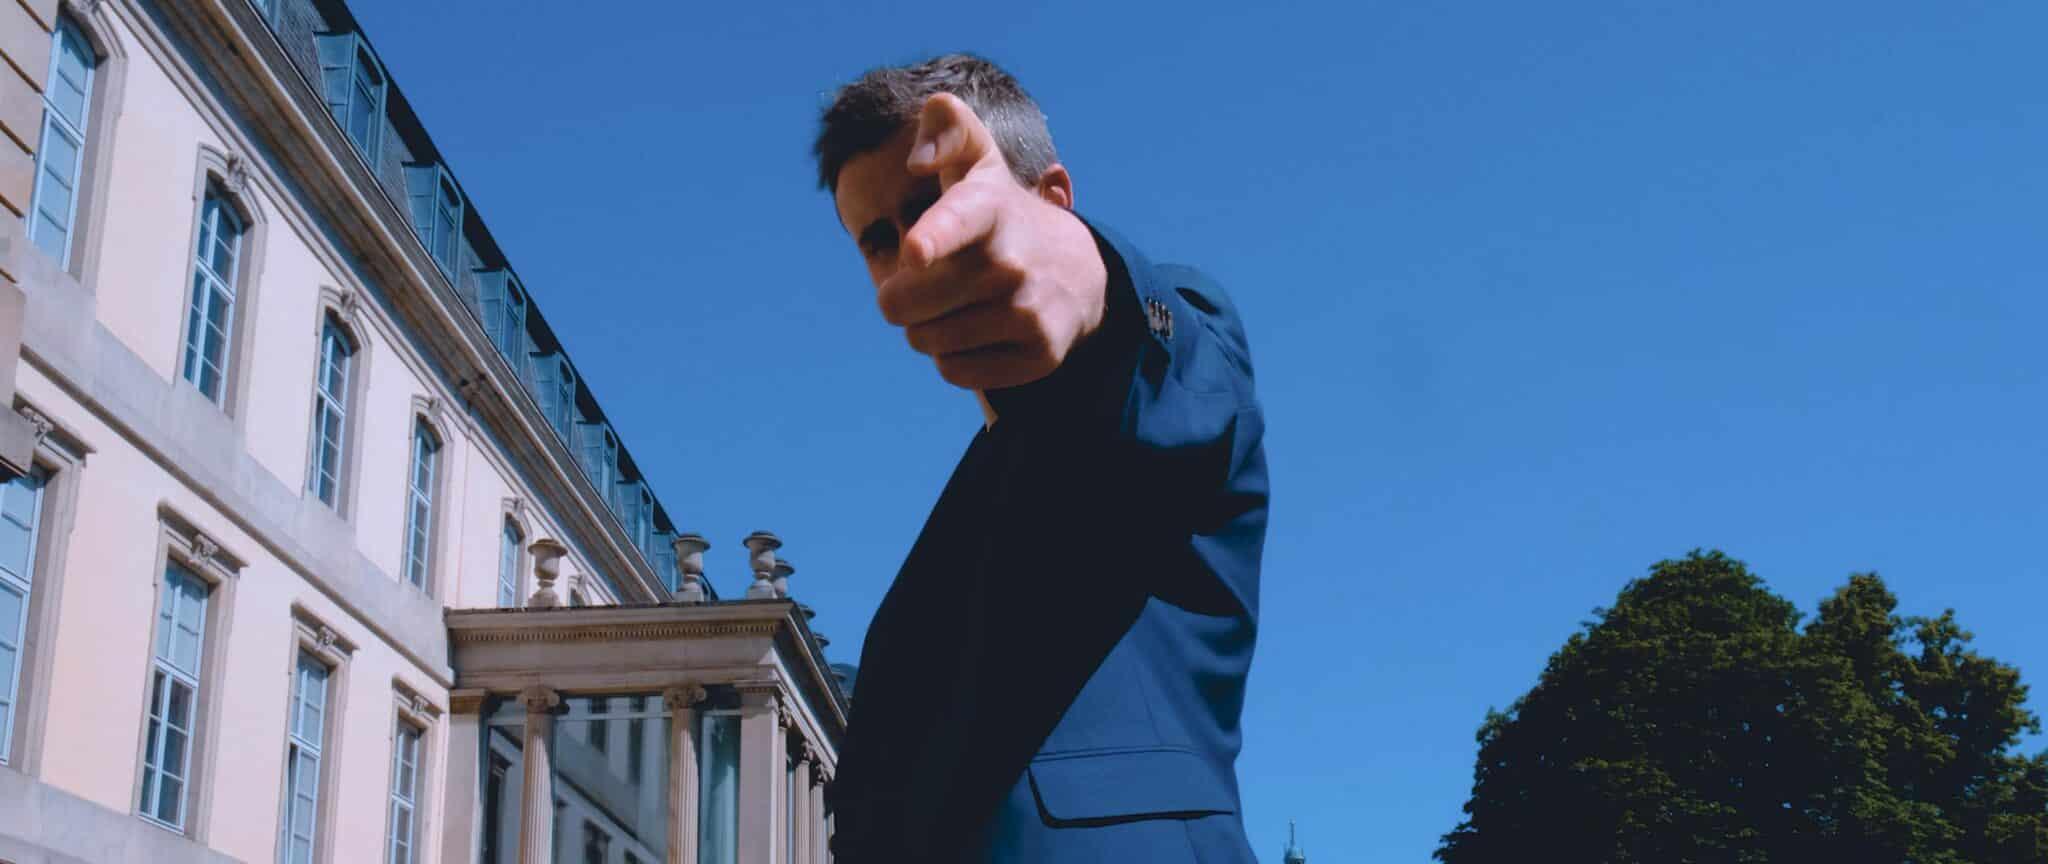 Blazin'Daniel - Bon Voyage (Official Video).00_00_11_15.Standbild254